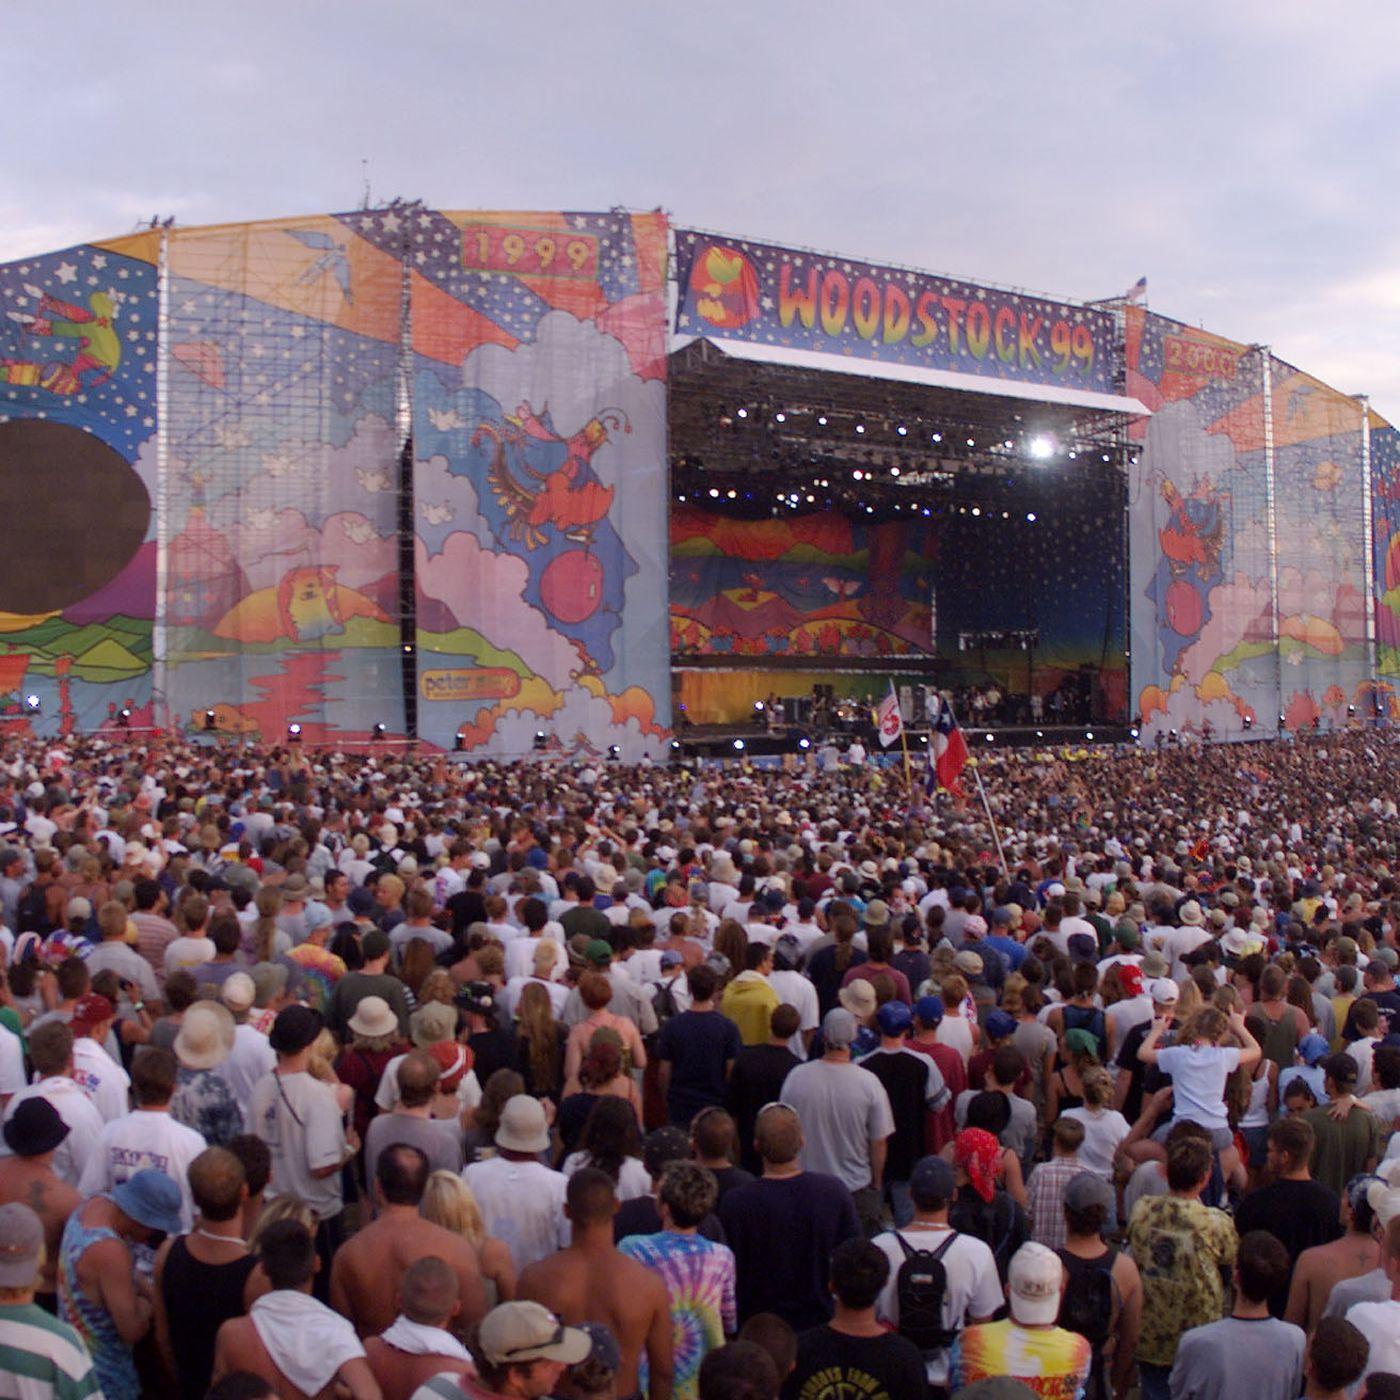 Break Stuff Episode 4 The Calm Before The Woodstock 99 Storm